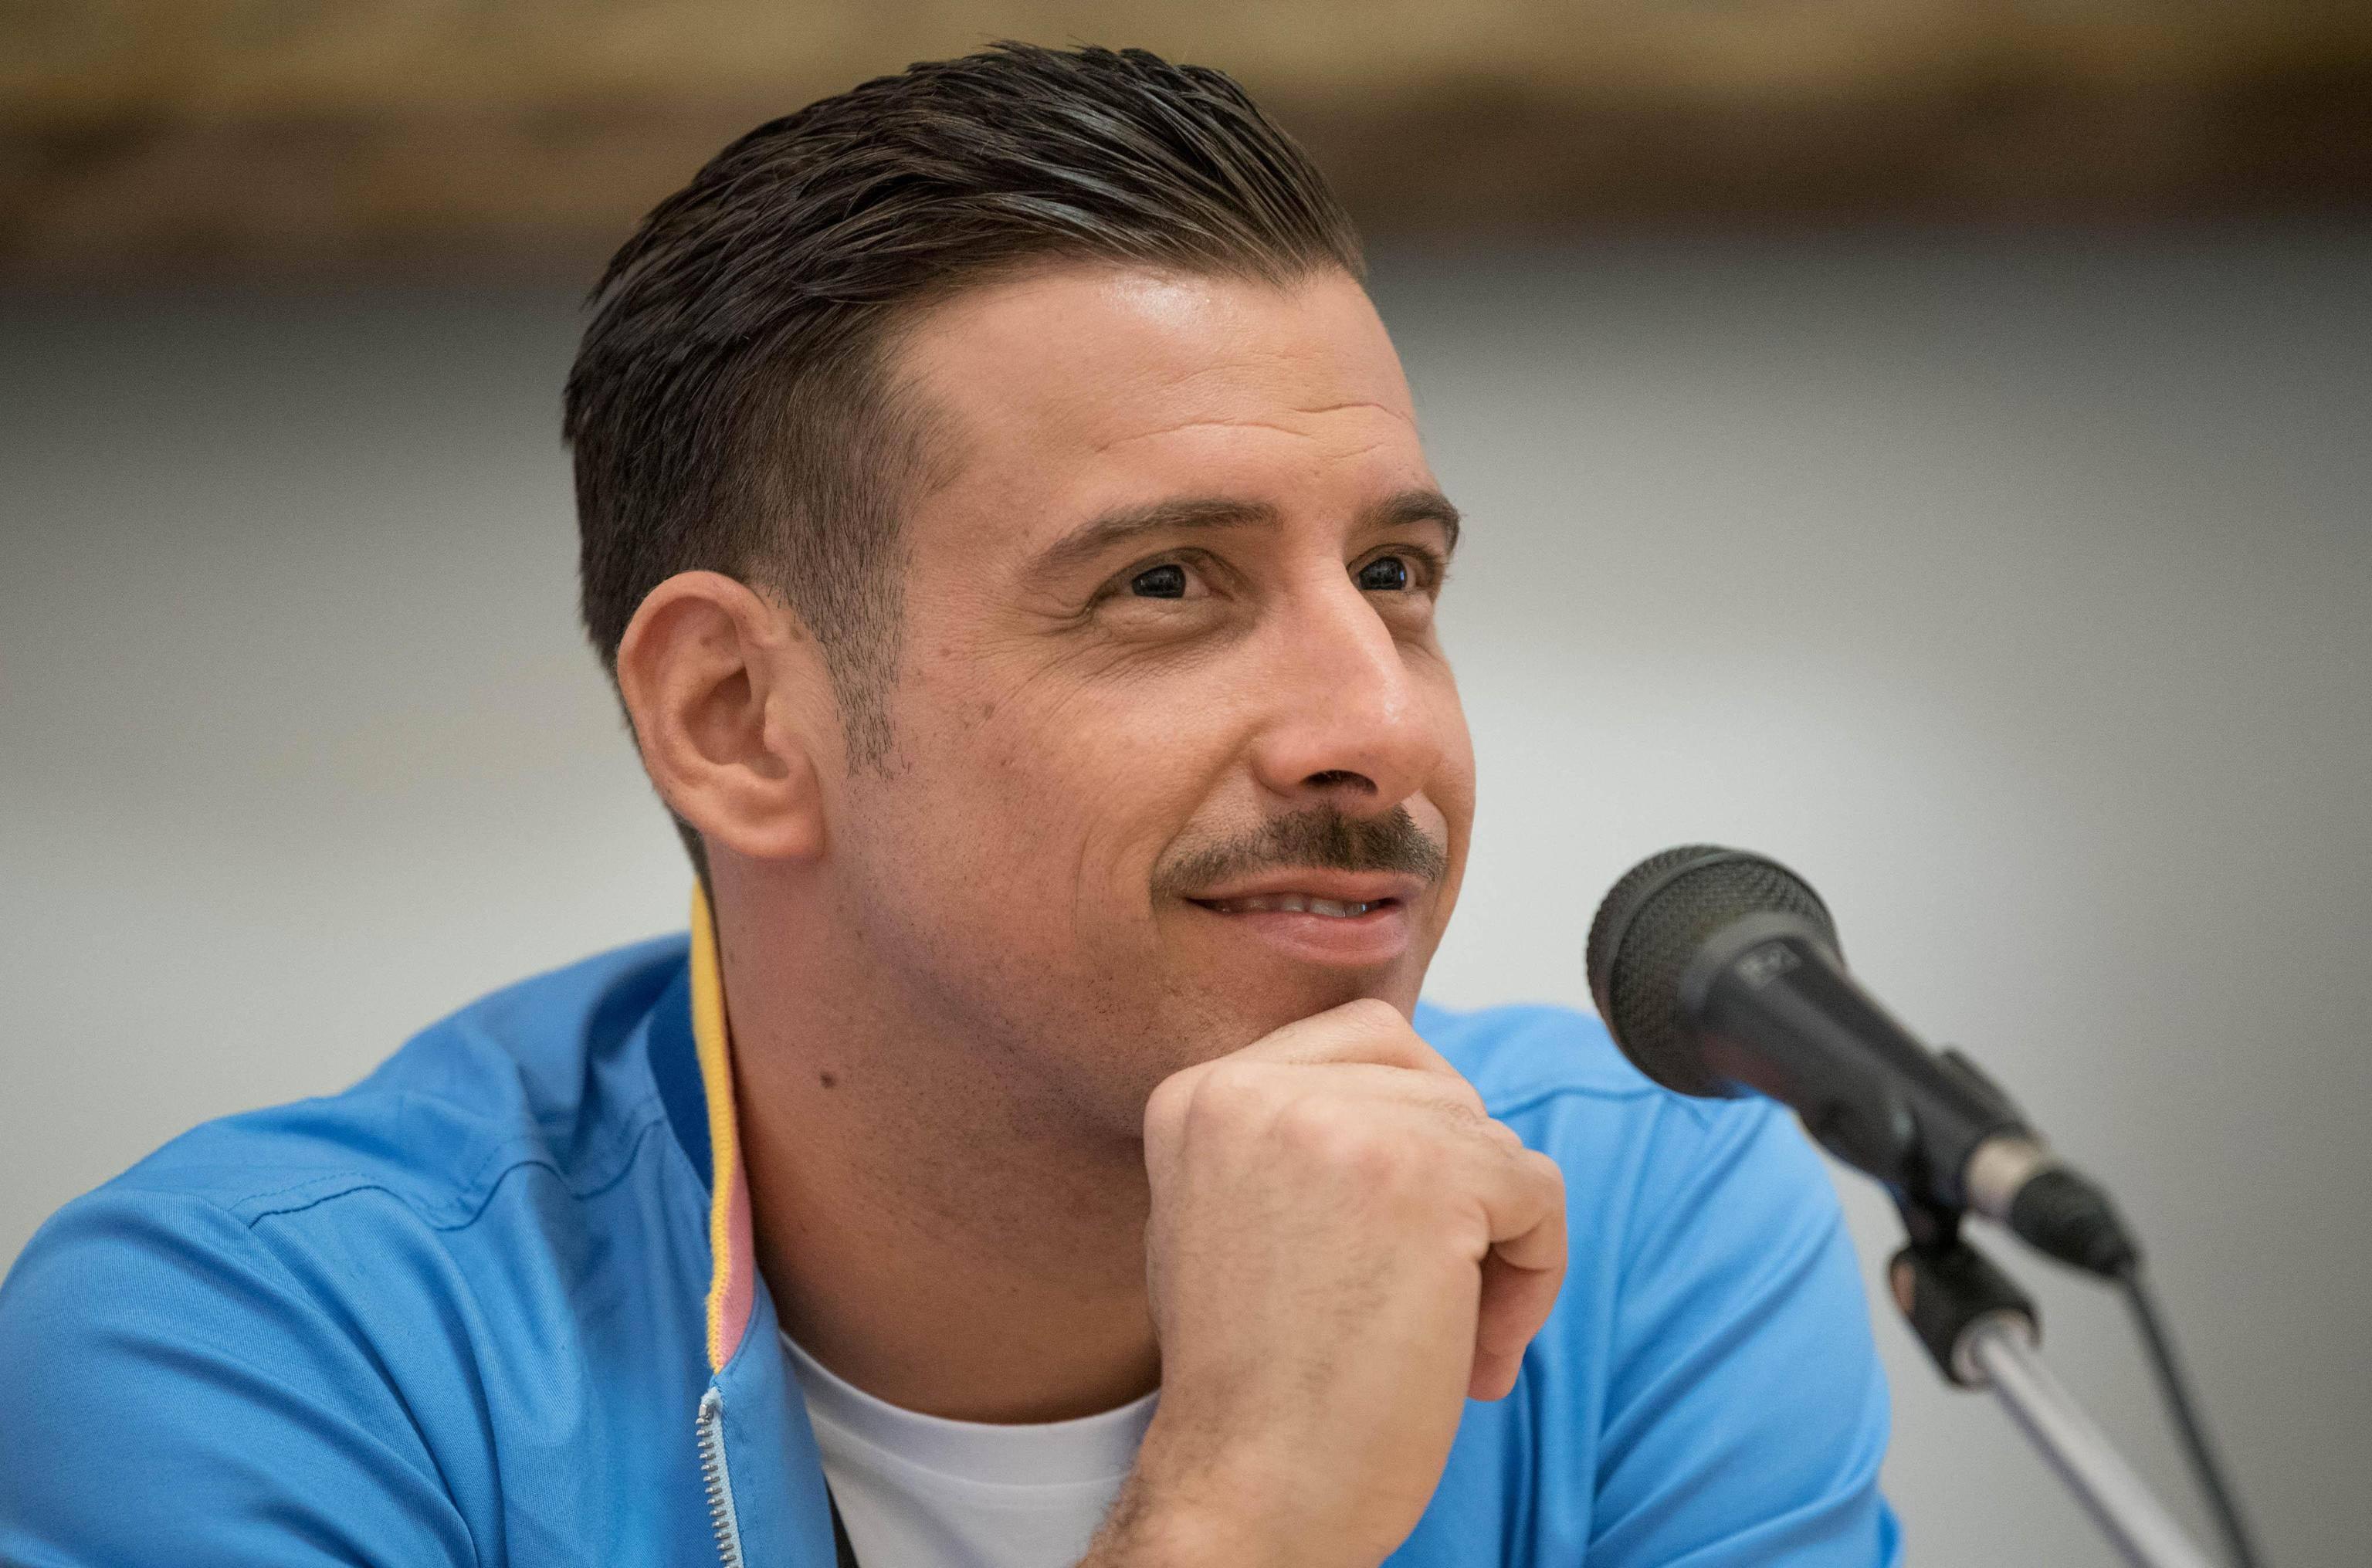 Francesco Gabbani, Amici 2018: età, carriera, news e relazioni